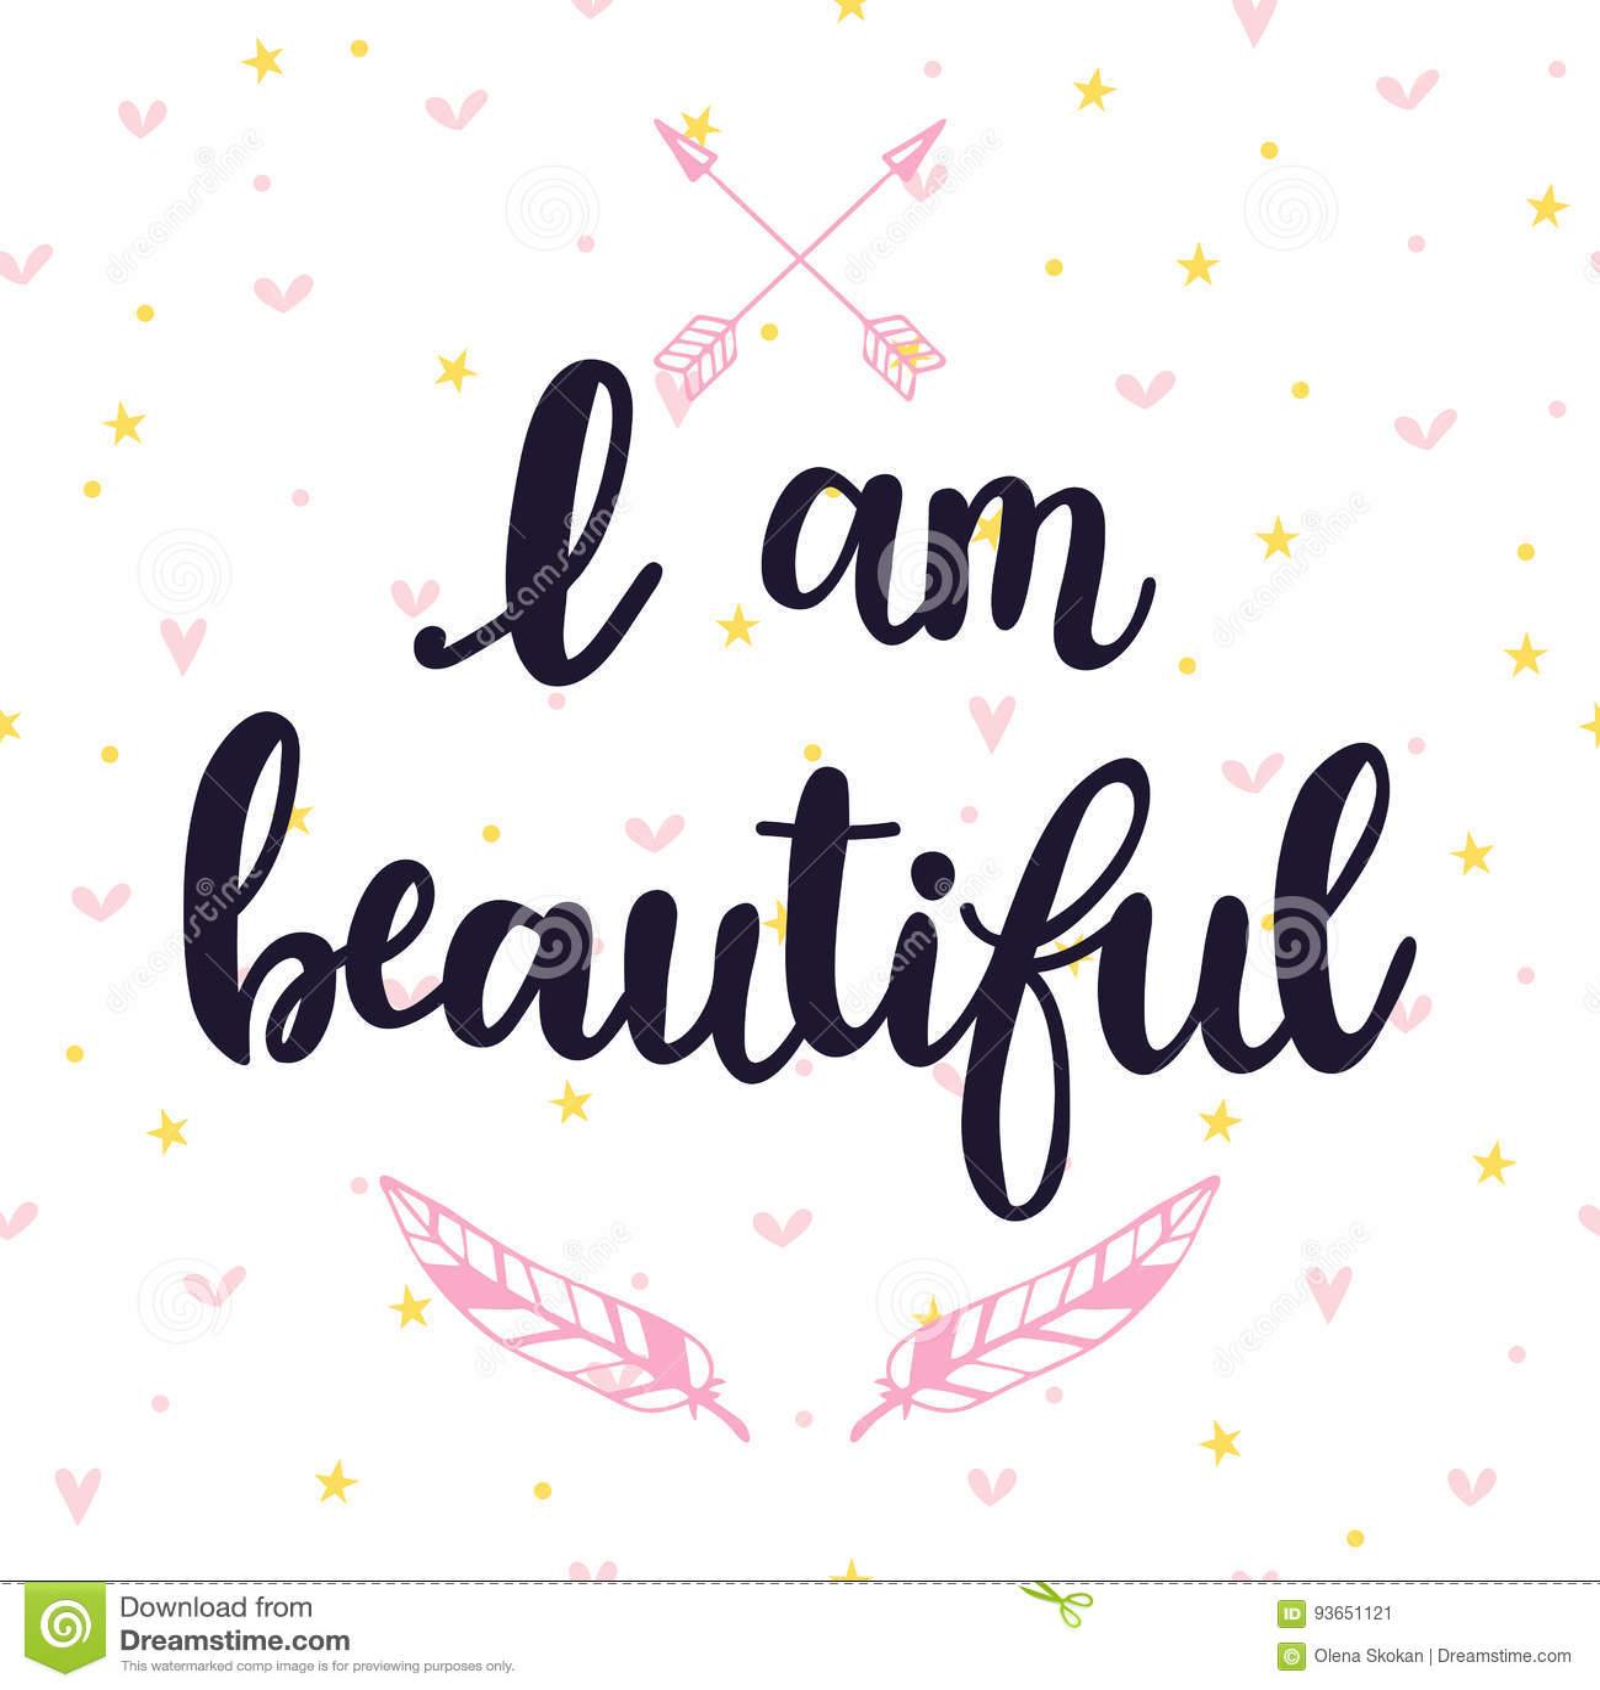 I am beautifull 31